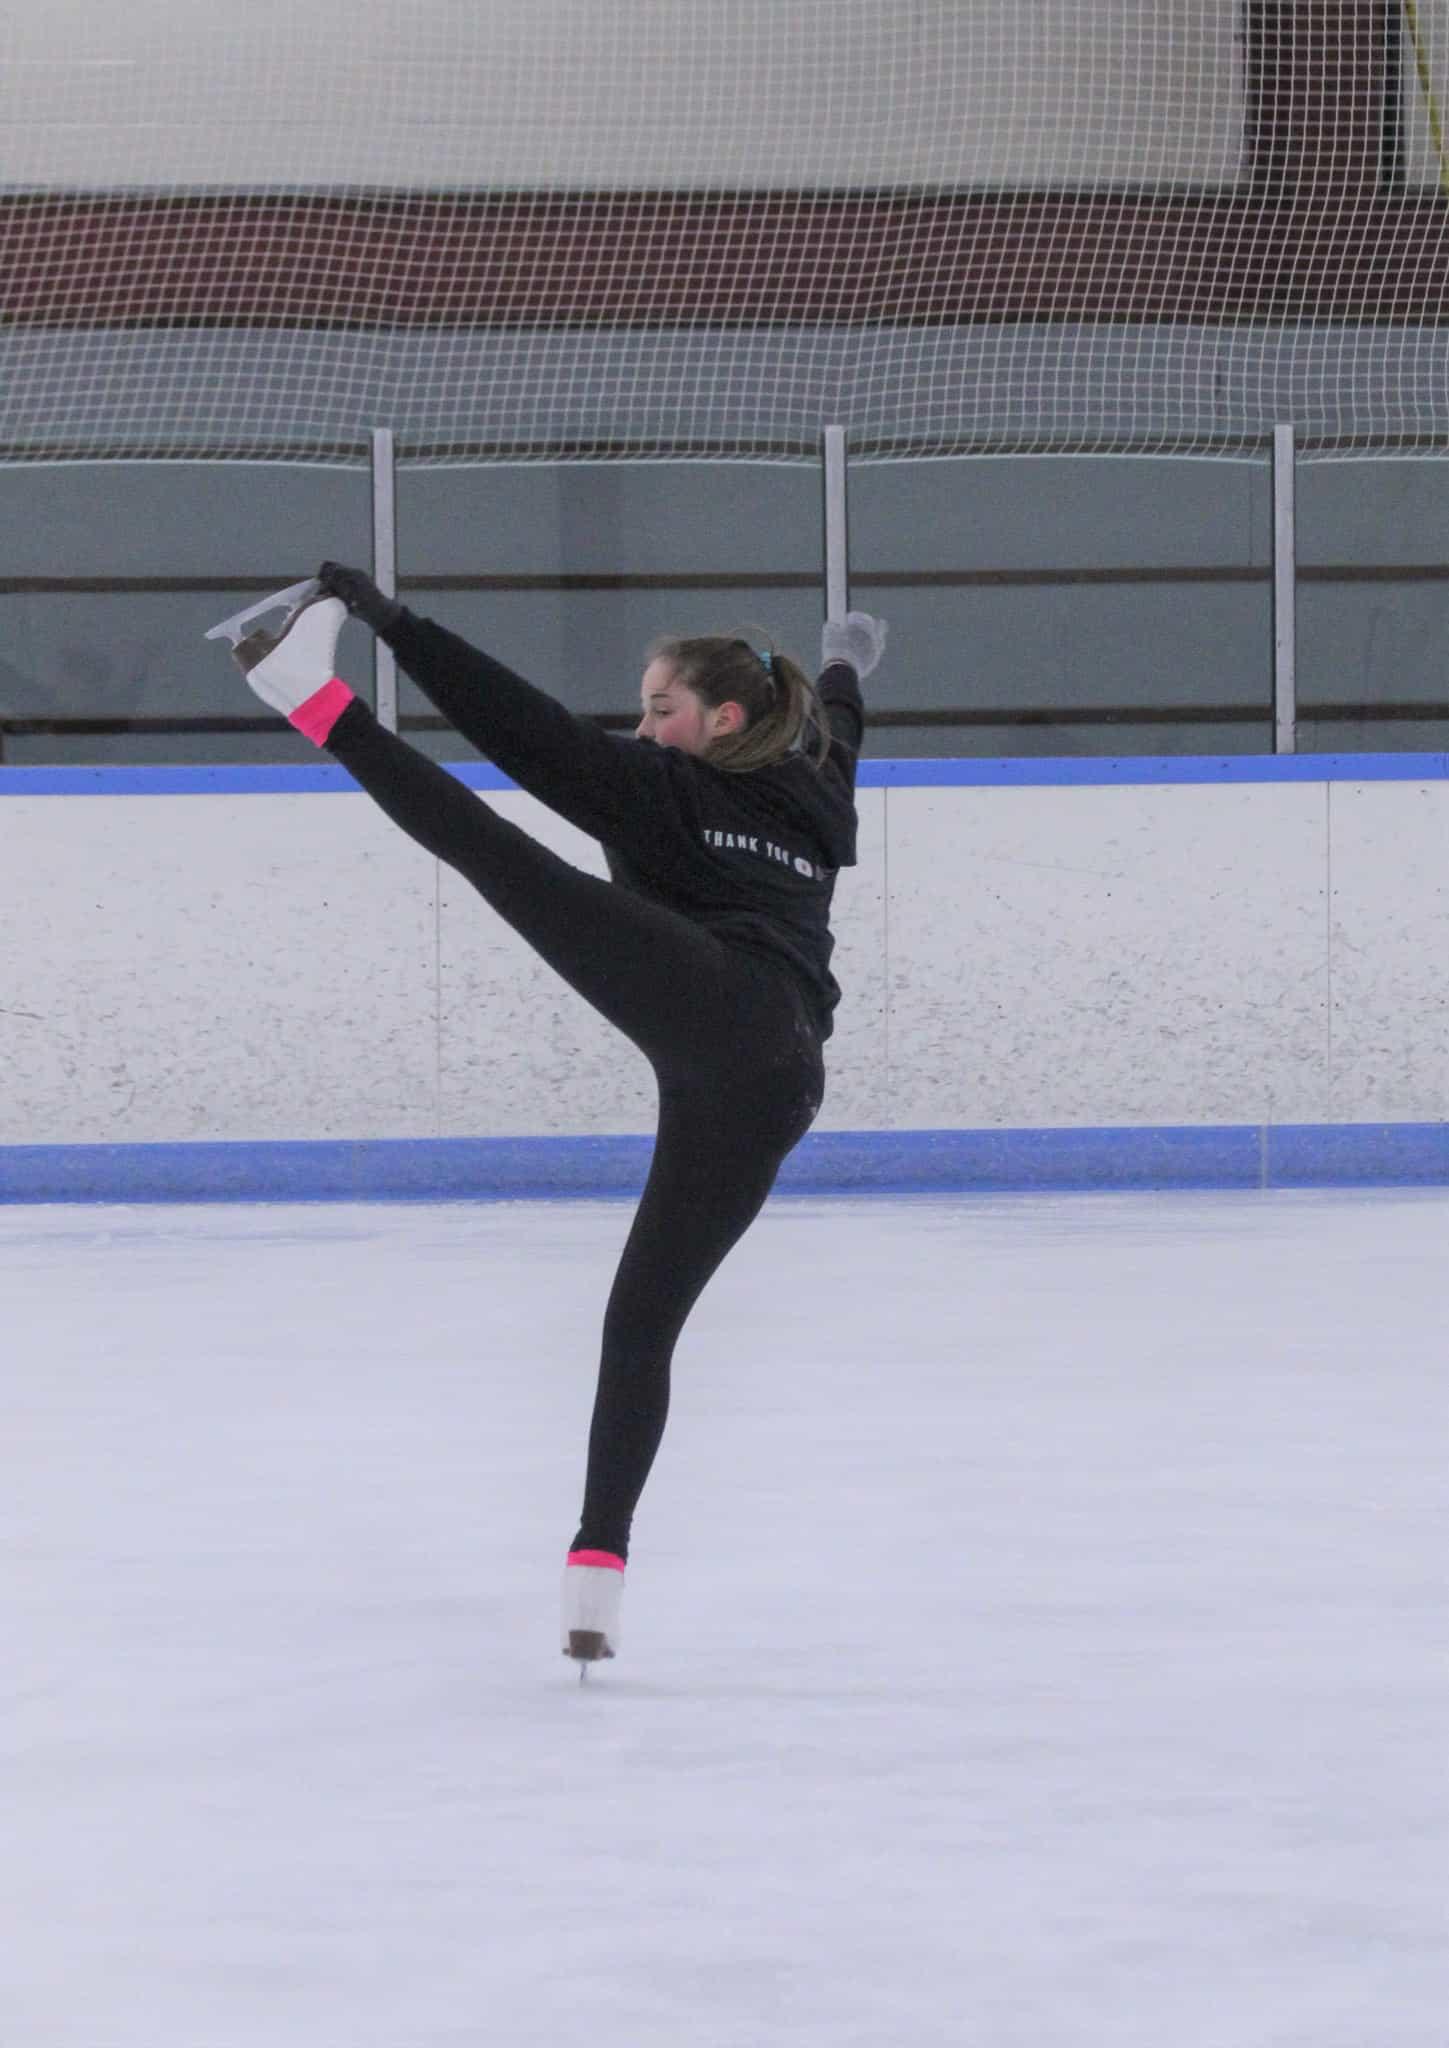 20210401-last skate 4